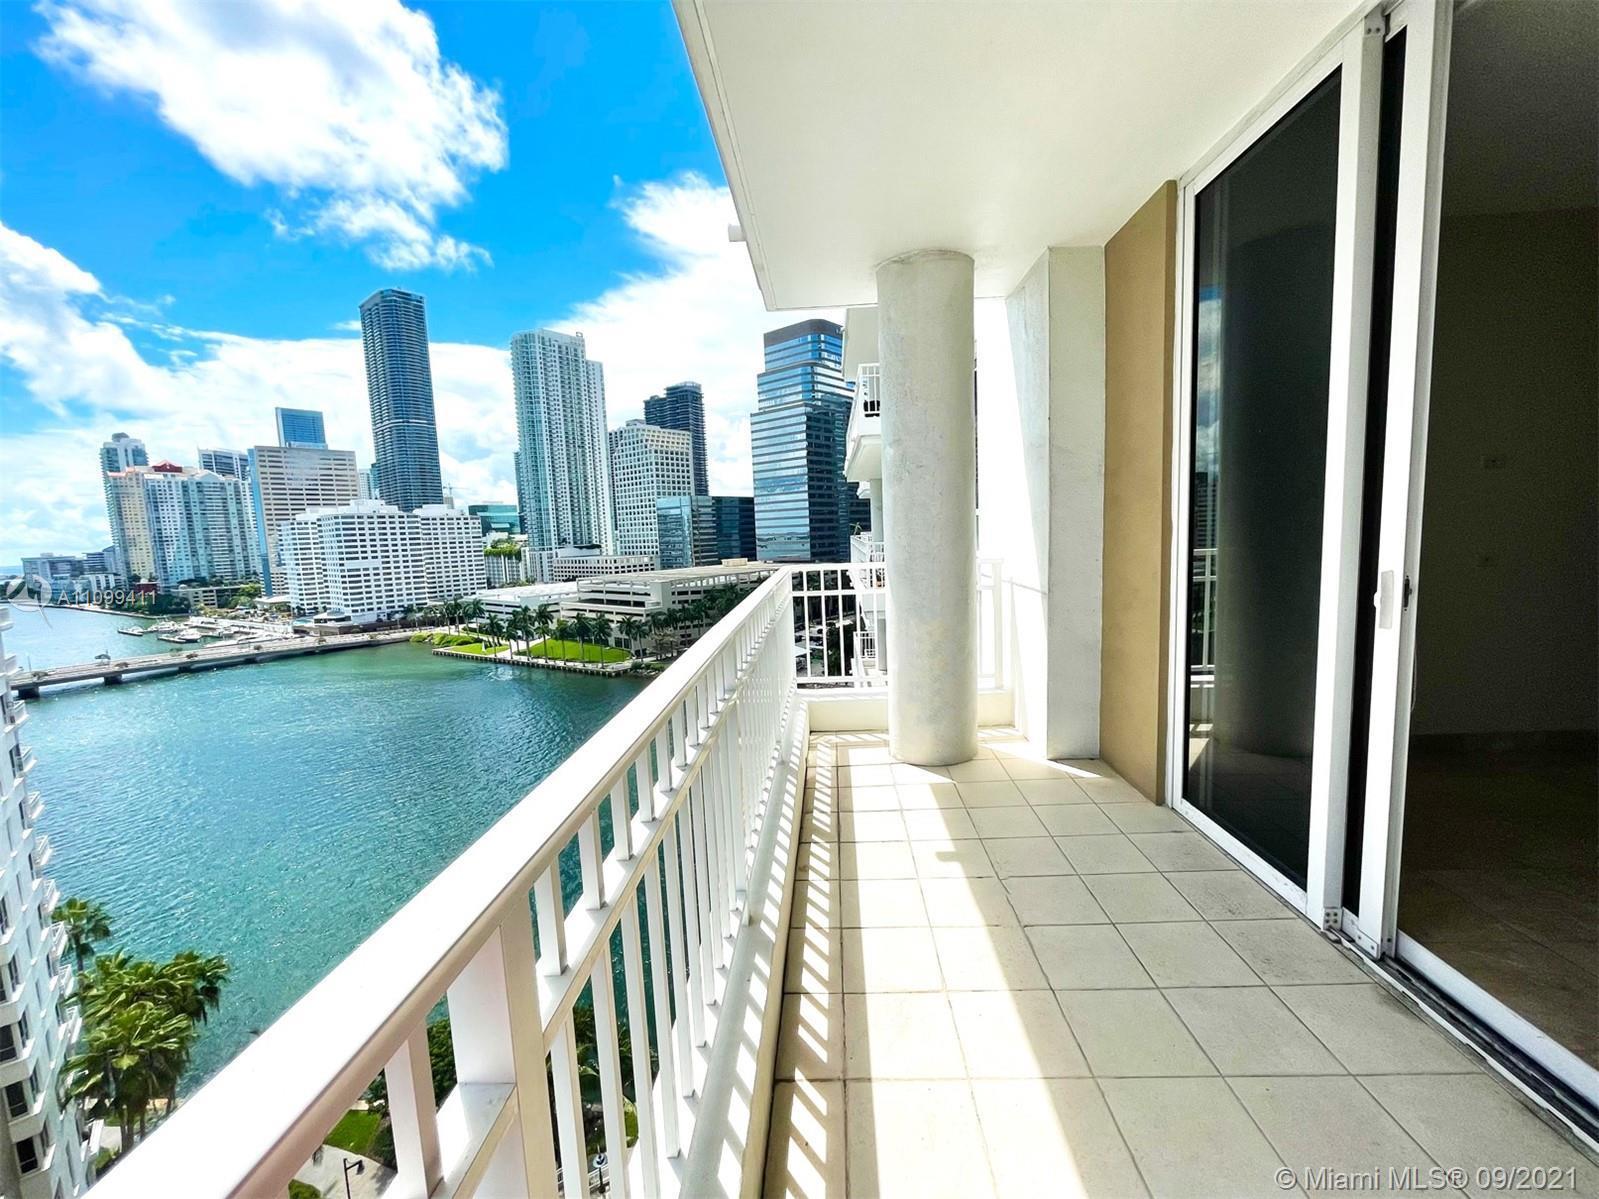 This one won't last !!! 1Bedroom 1.5Bath Condo in the exclusive Brickell Key island. 14th Floor, Fea